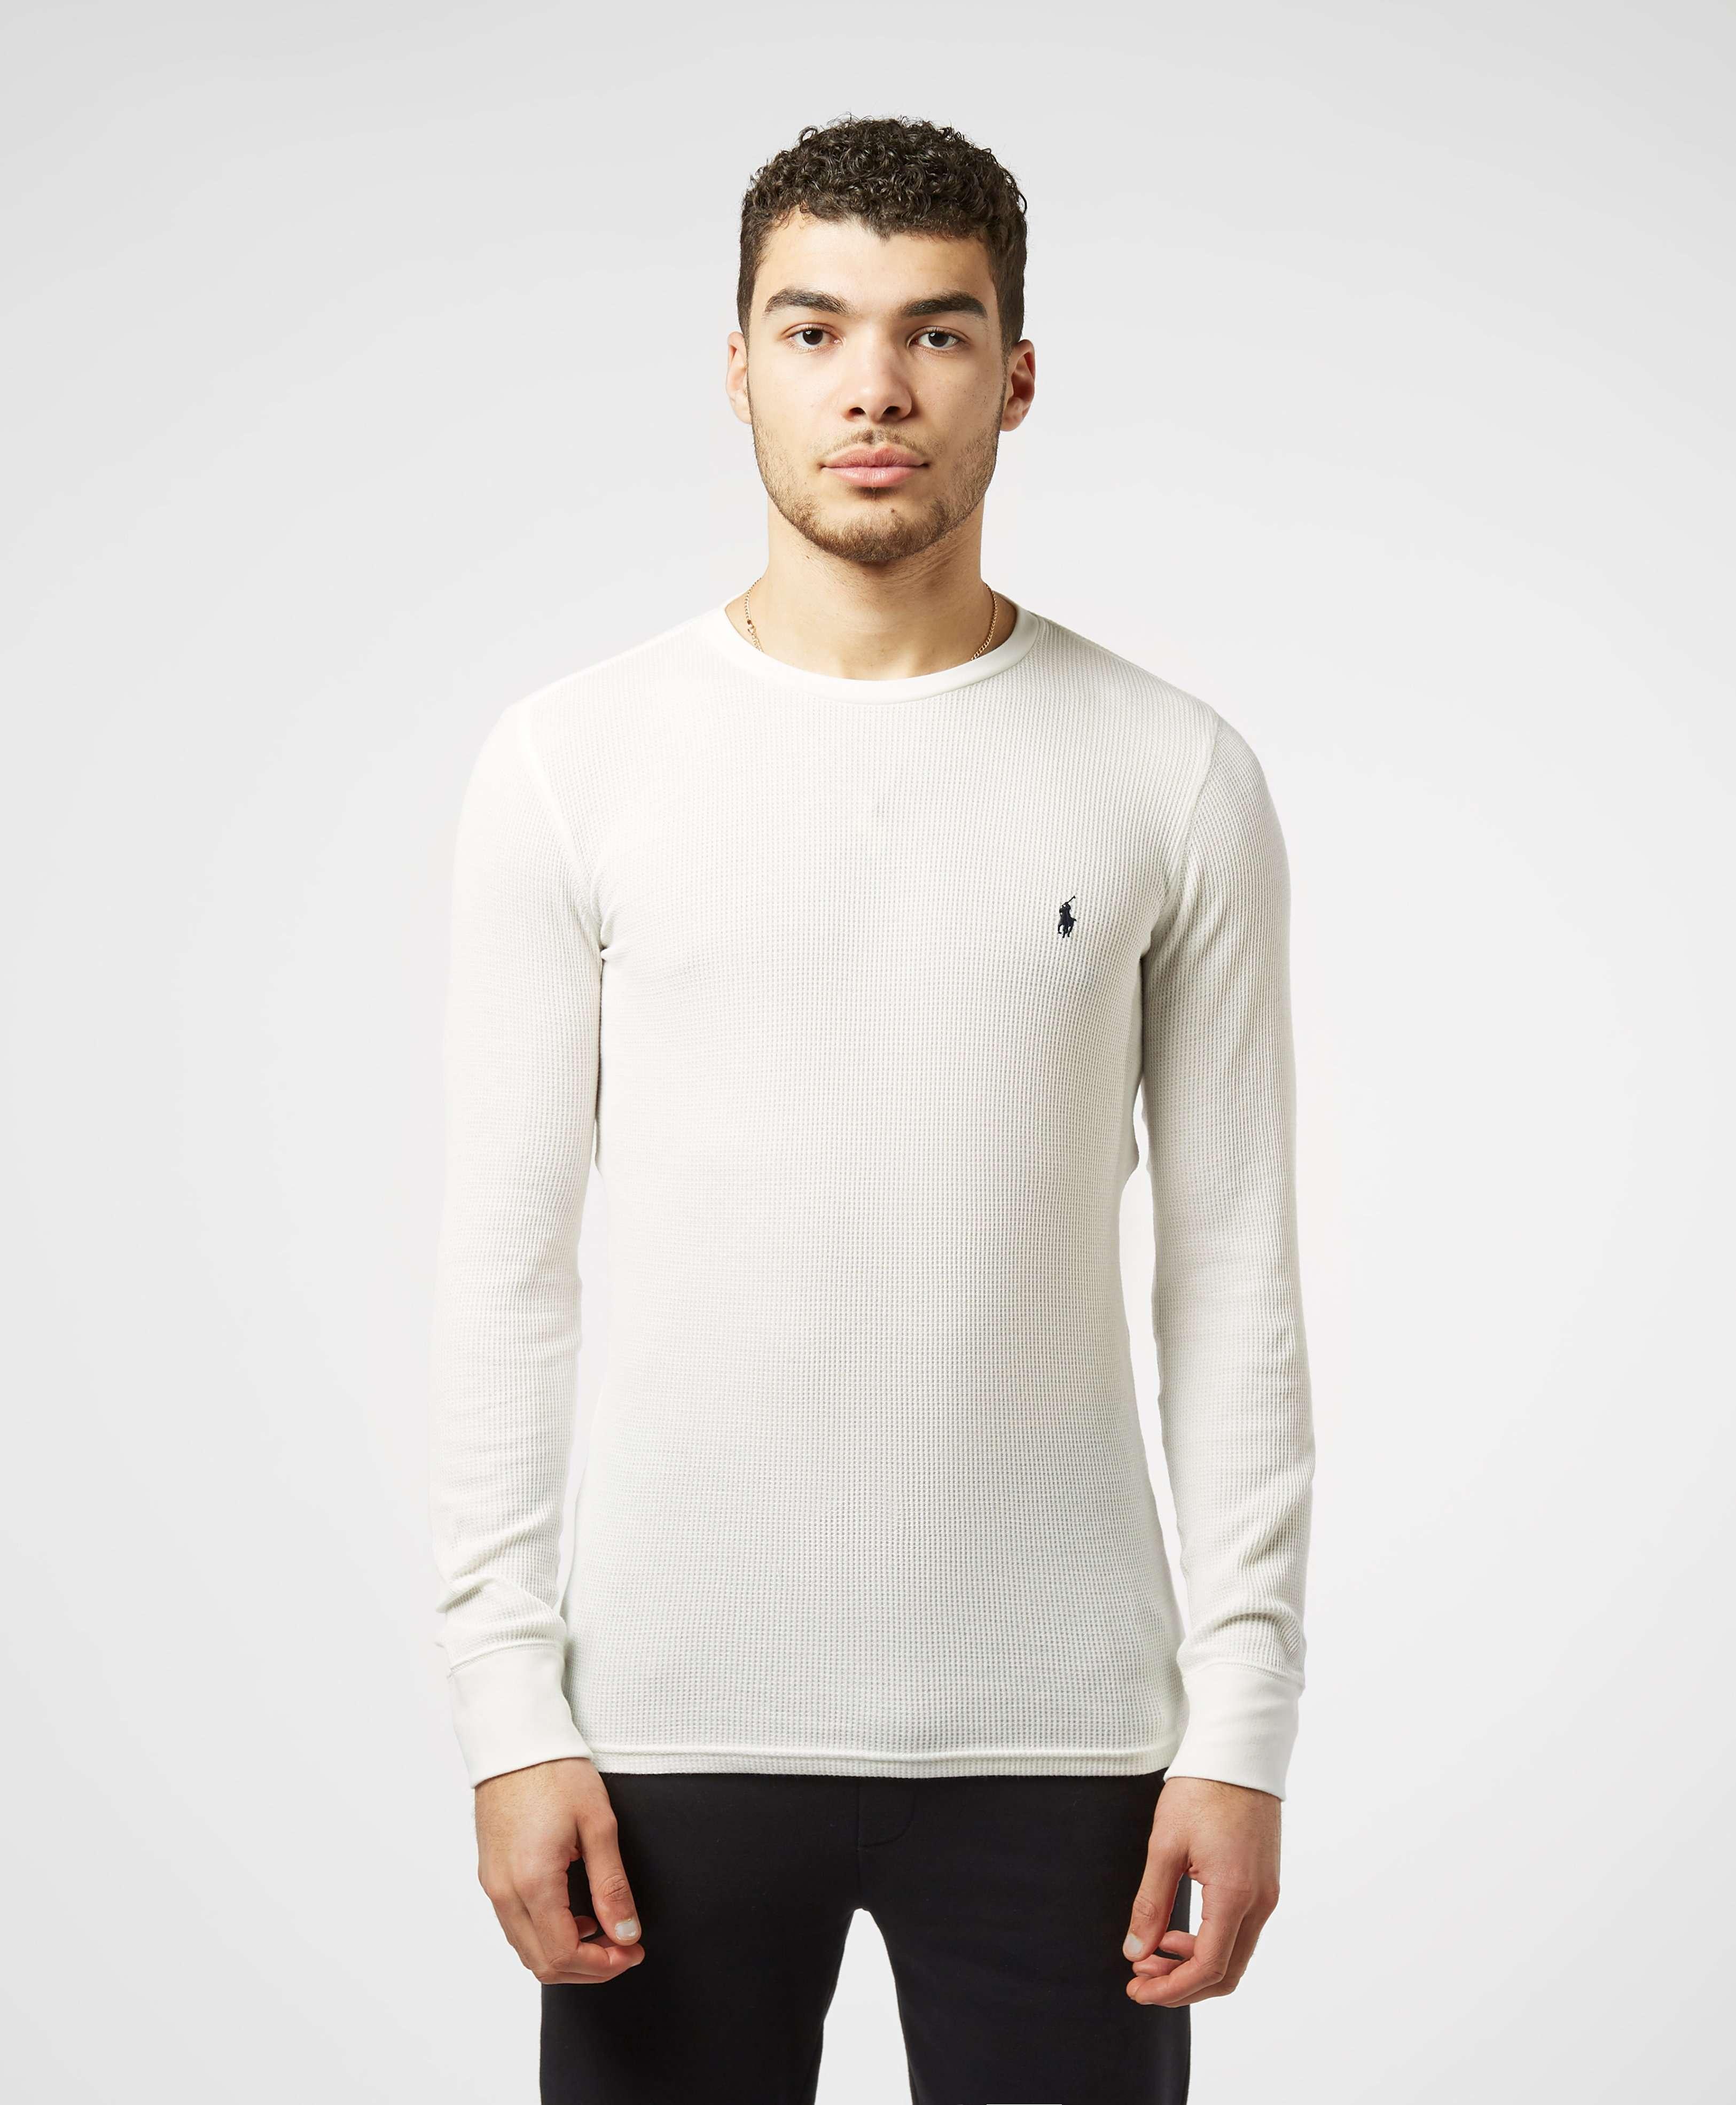 ShirtScotts Menswear Lauren T Underwear Waffle Polo Ralph Mini Long Sleeve ARjLq354